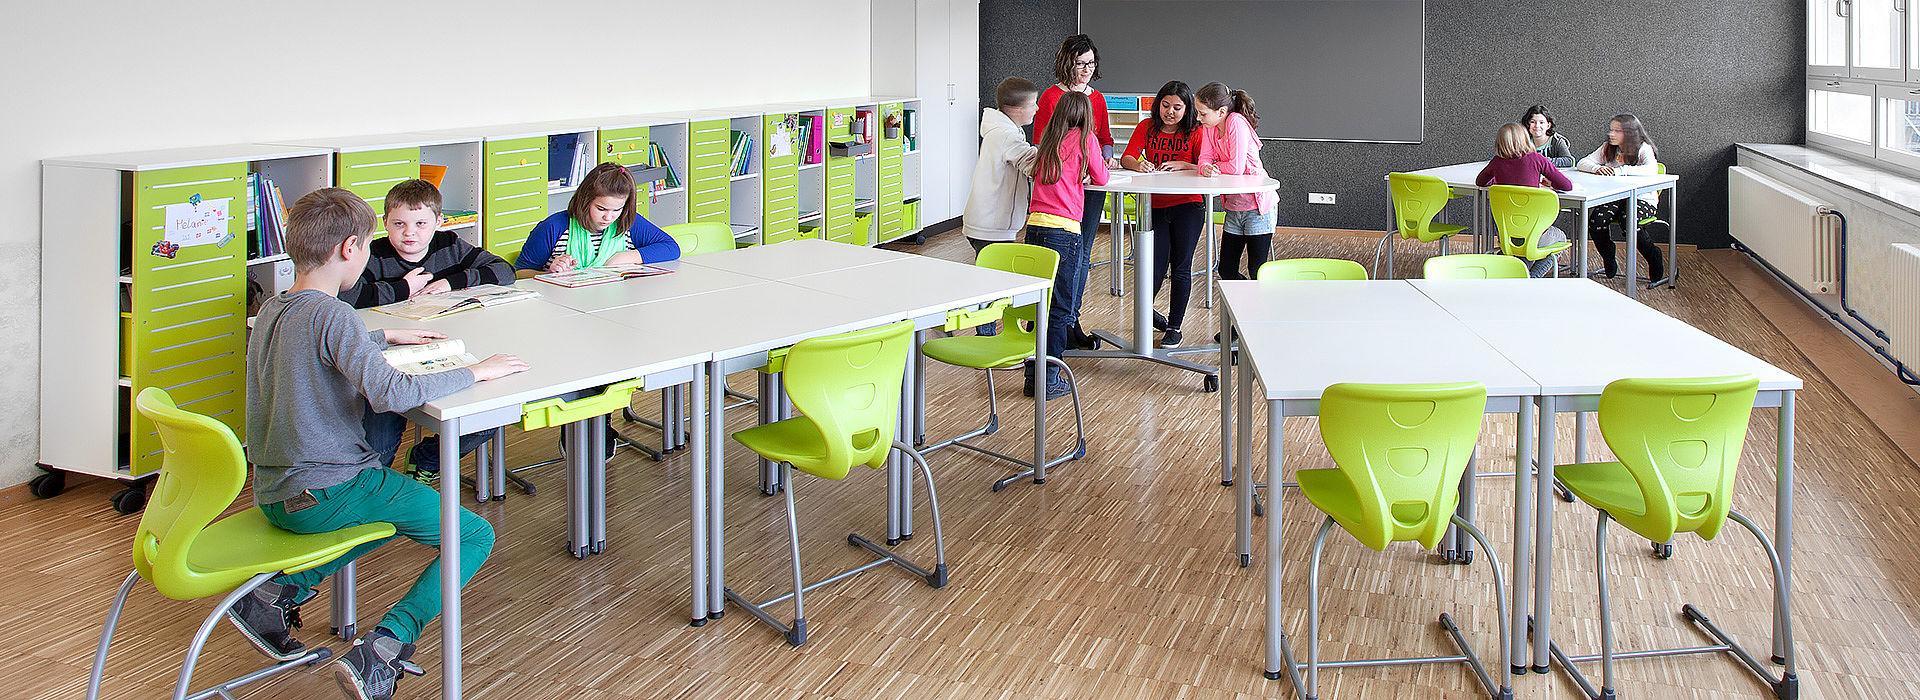 salle de classe flexible - interaction